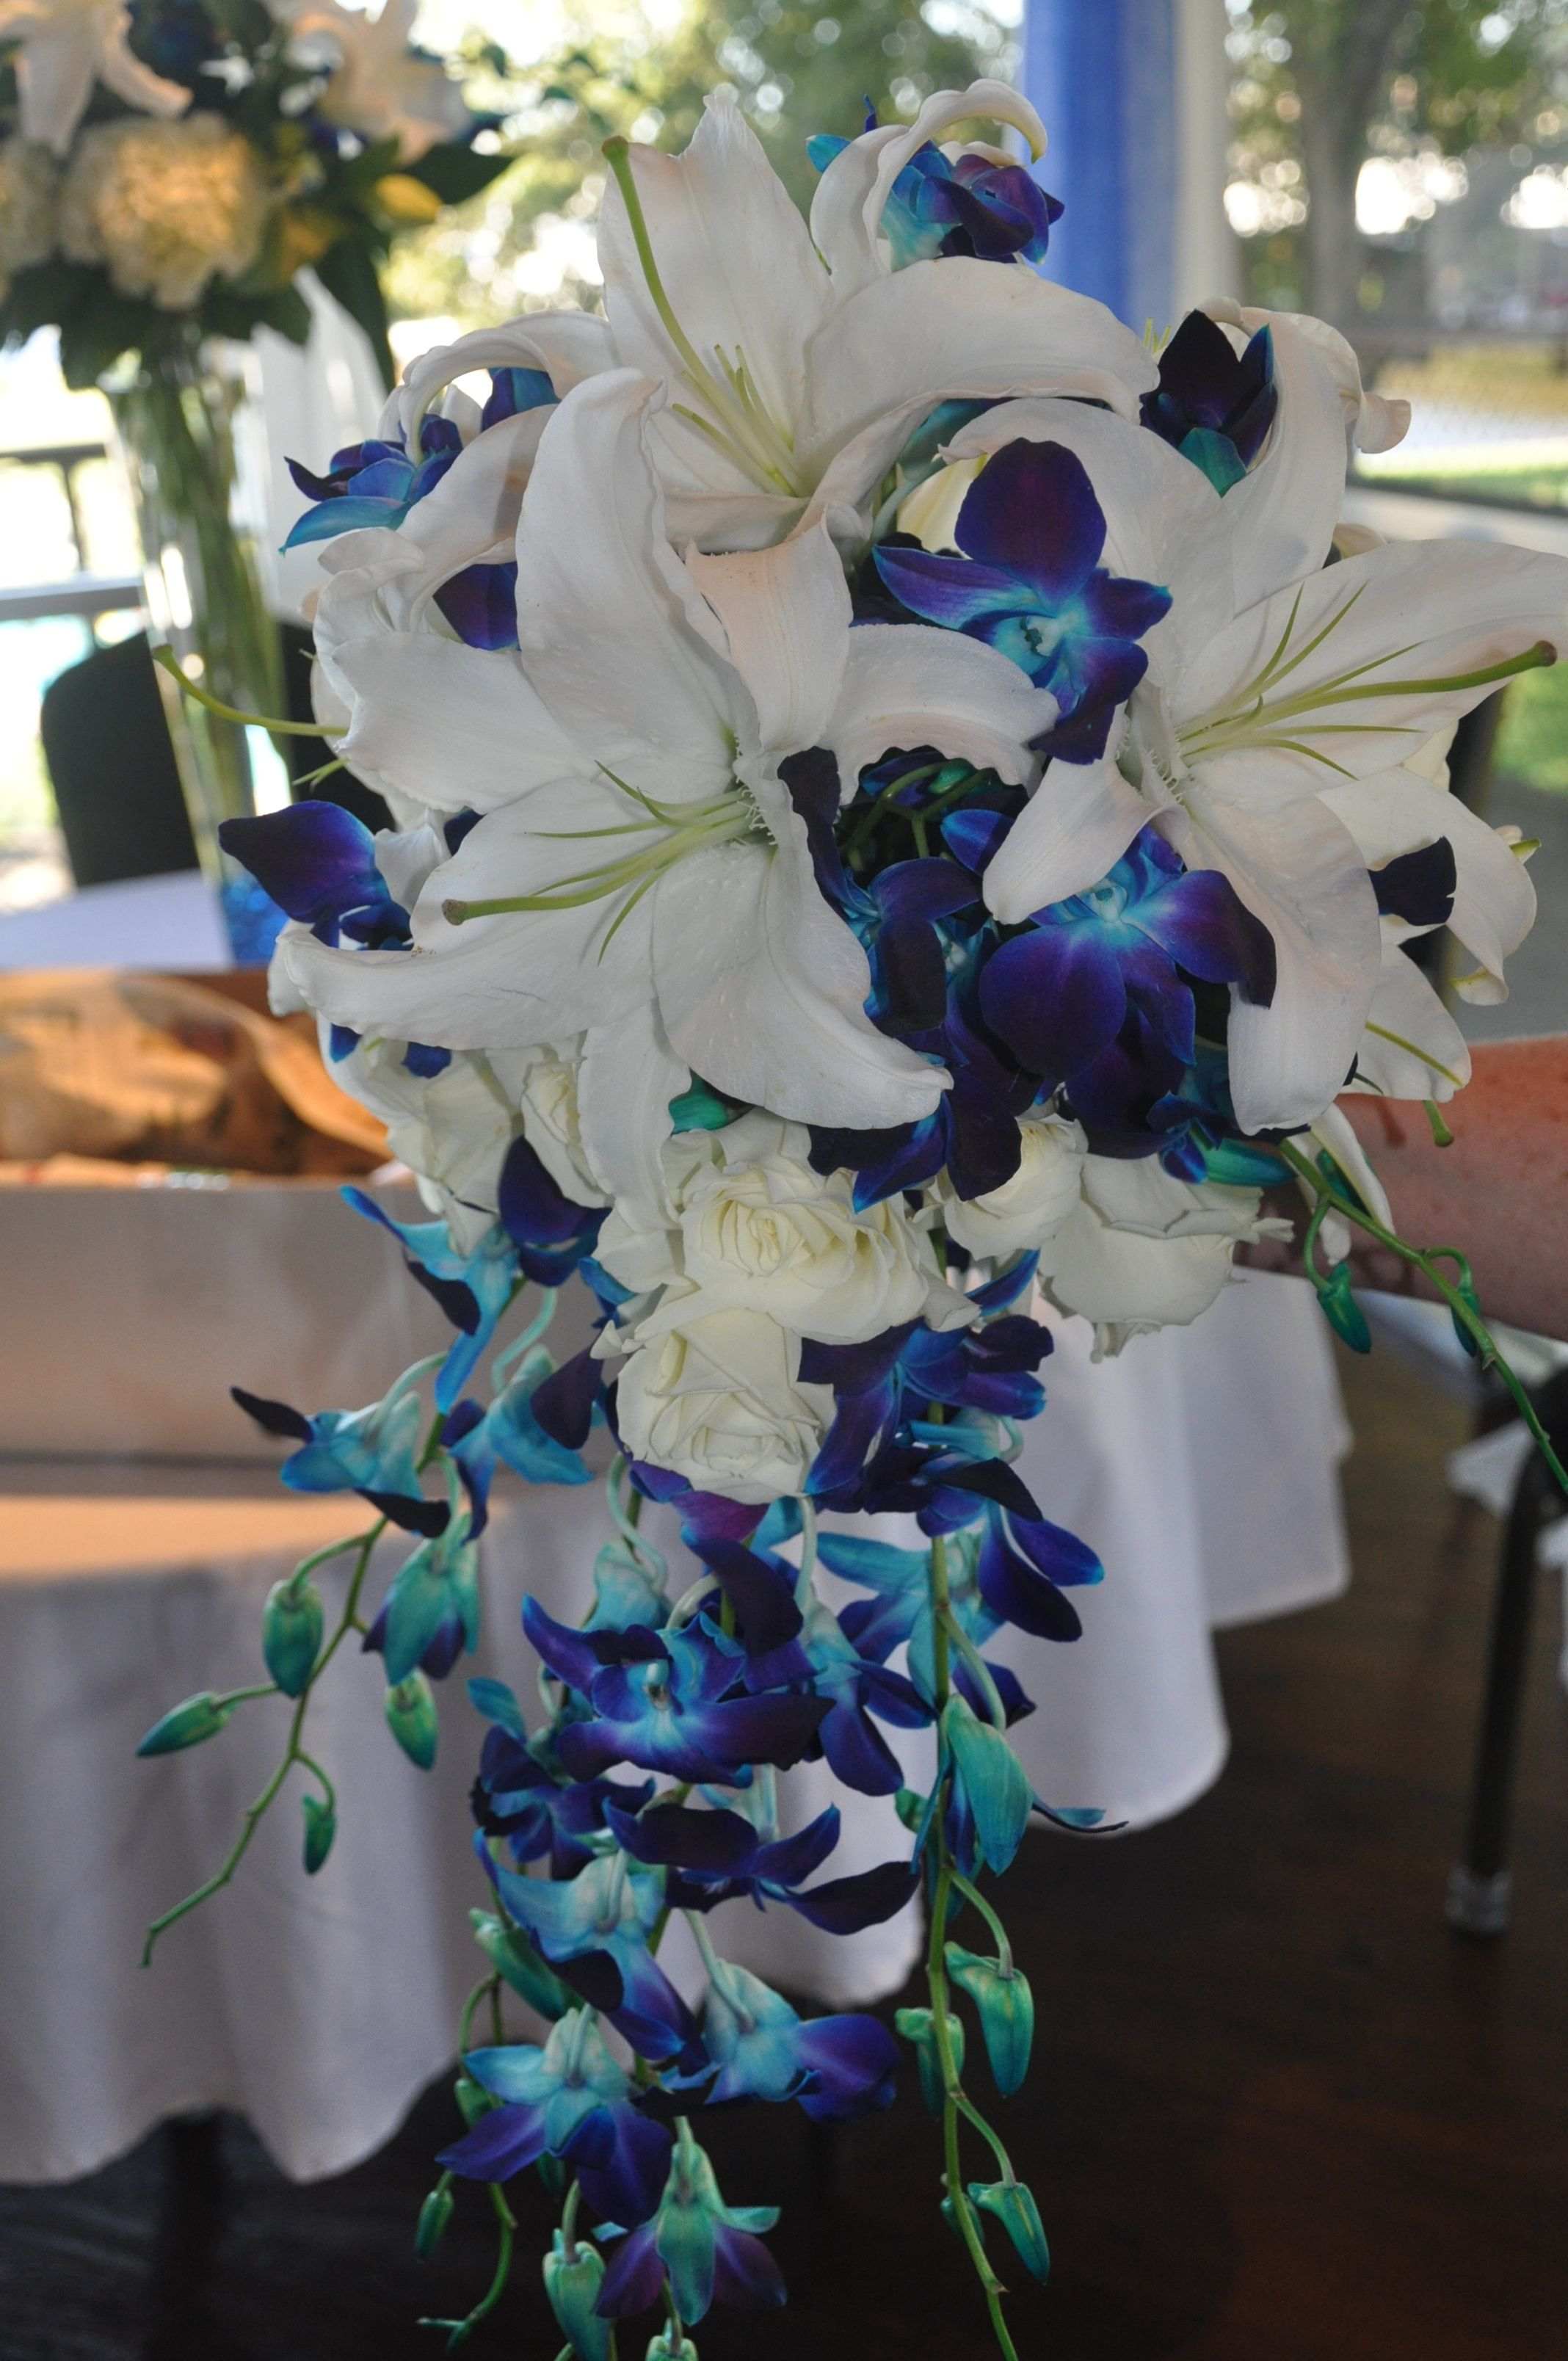 Pin By Frenchie Aragon On Wedding Decoration Ideas In 2020 Wedding Flower Guide Wedding Bridal Bouquets Bridal Bouquet Blue